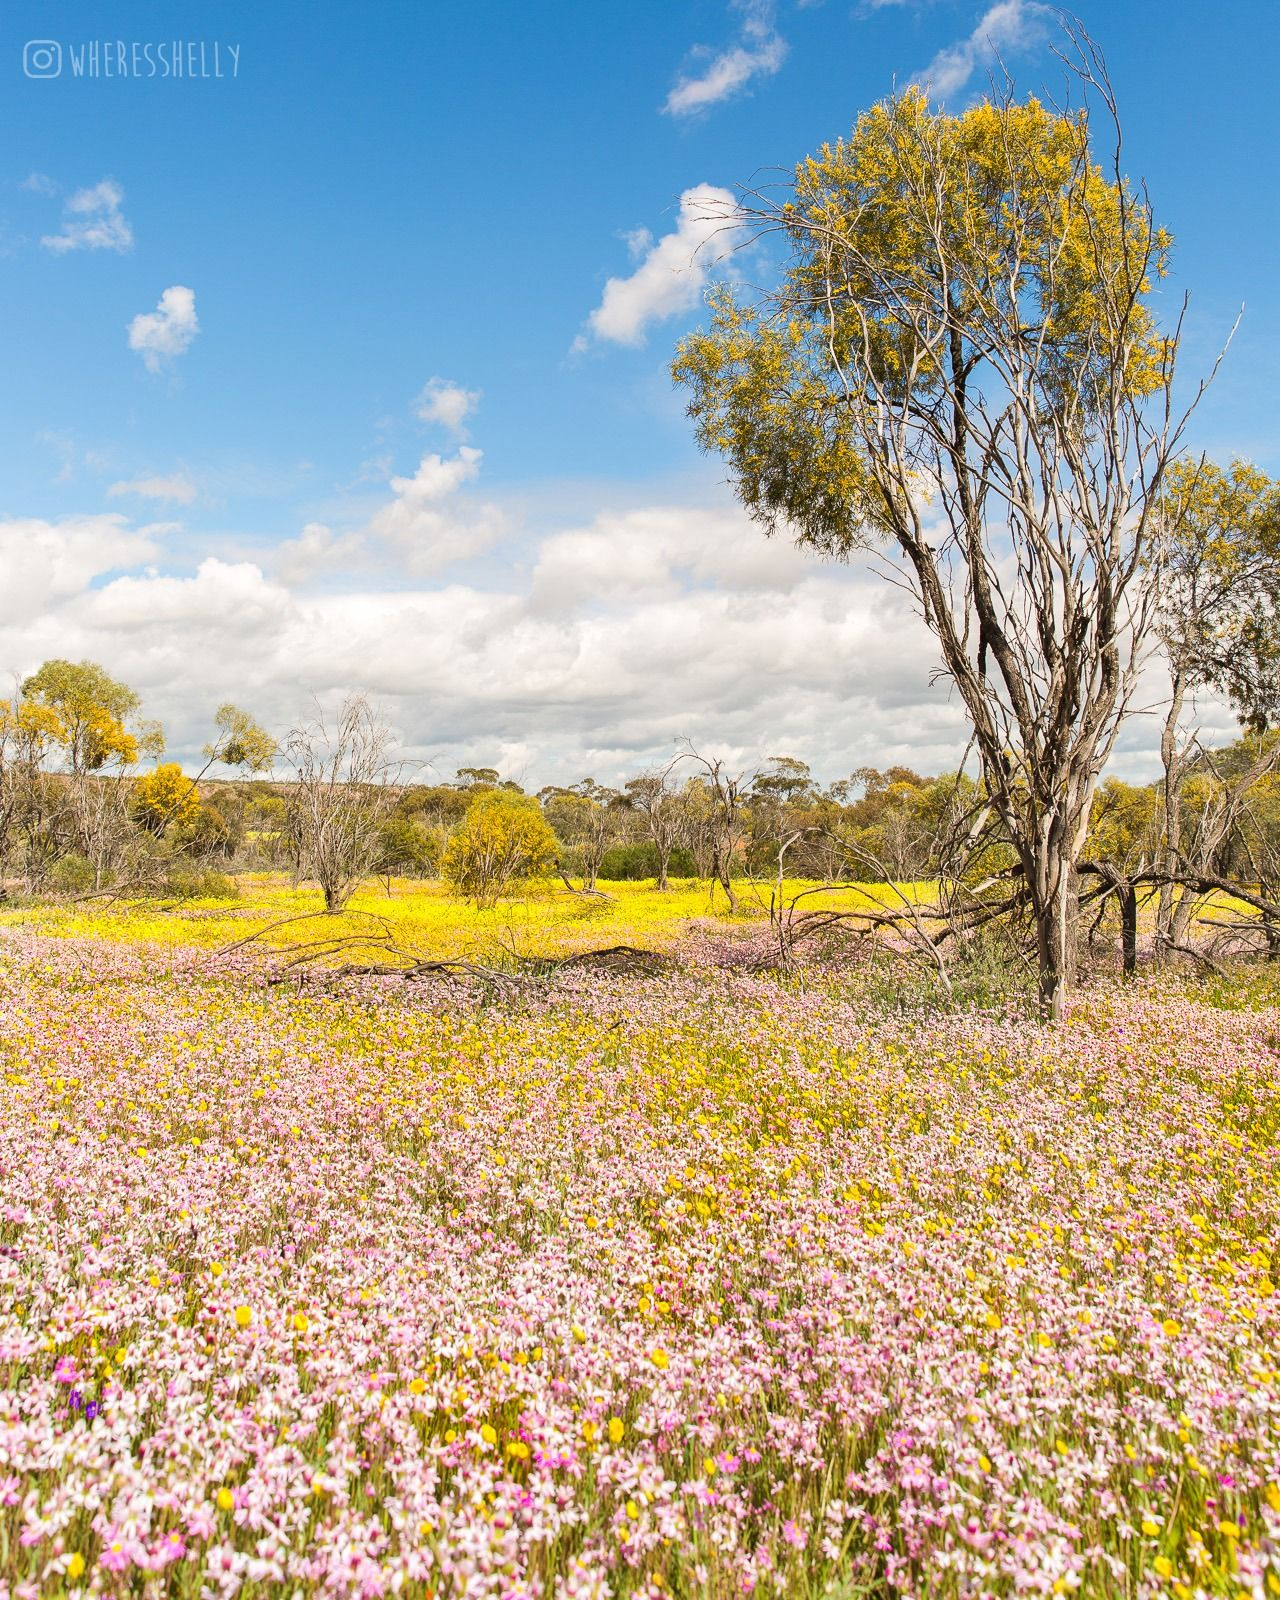 Wildflowers in Western Australia Australian wildflowers